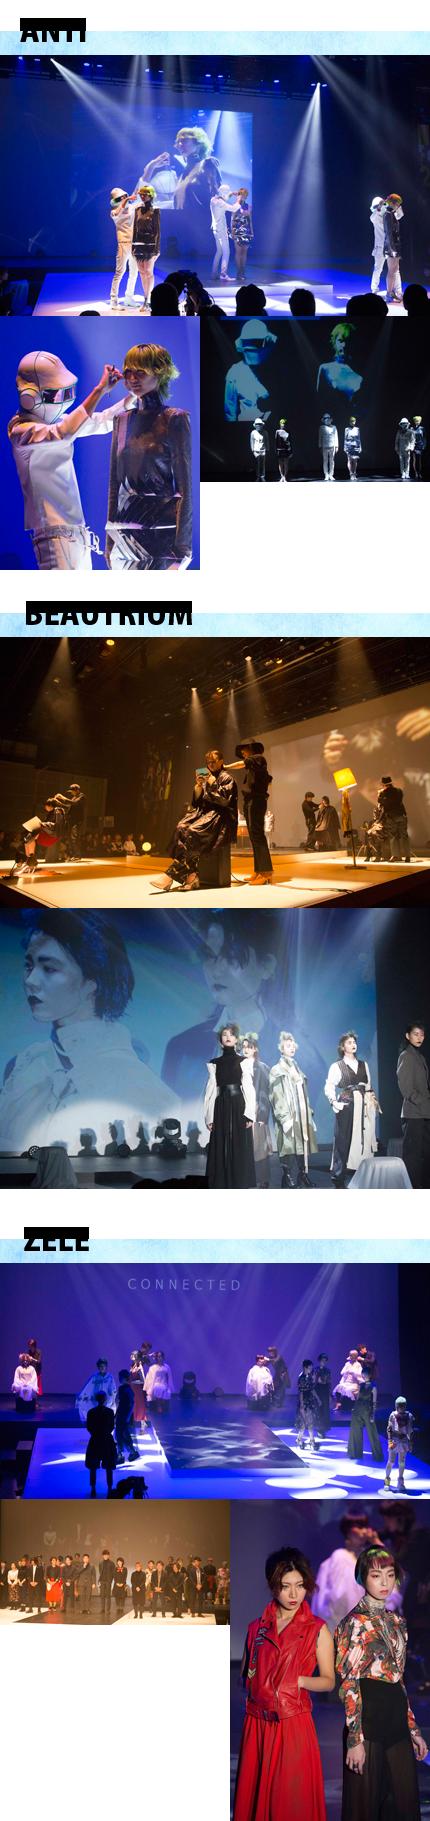 nakano_live_stage